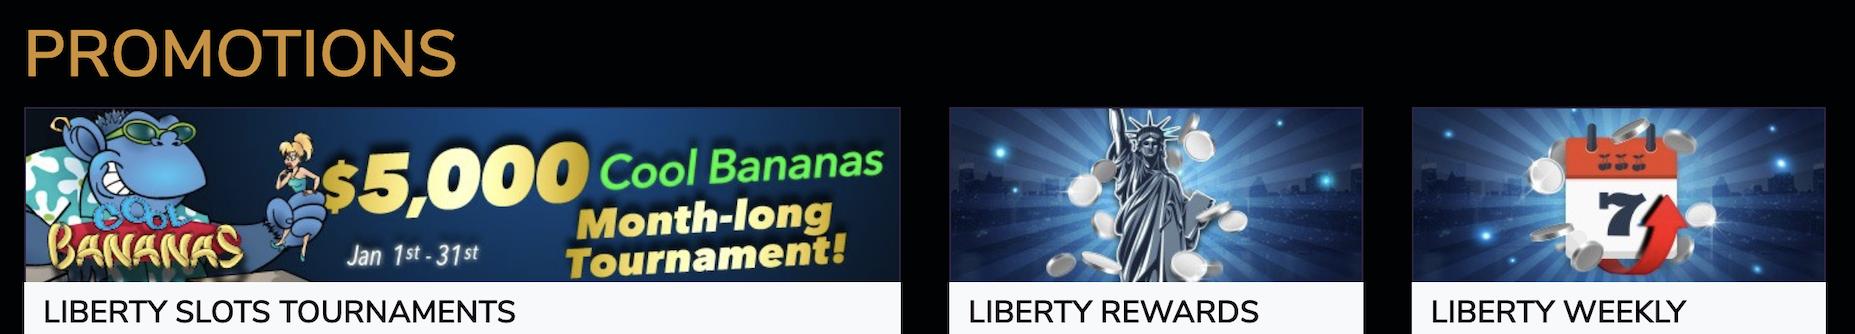 LibertySlotsPromos